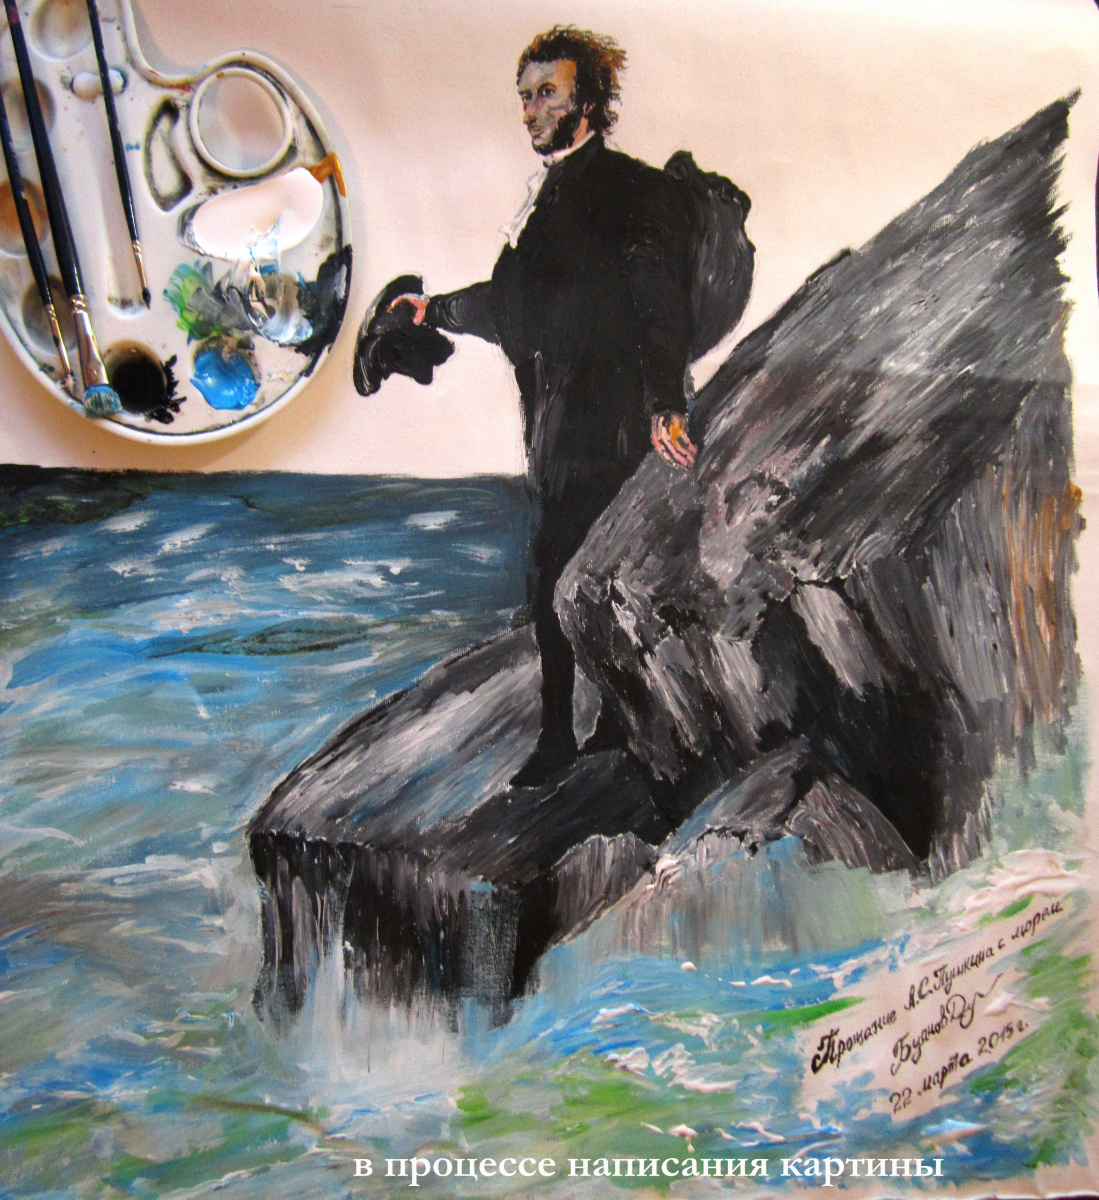 "Дмитрий Юрьевич Буянов. In the process of painting ""Pushkin Farewell to the sea"""